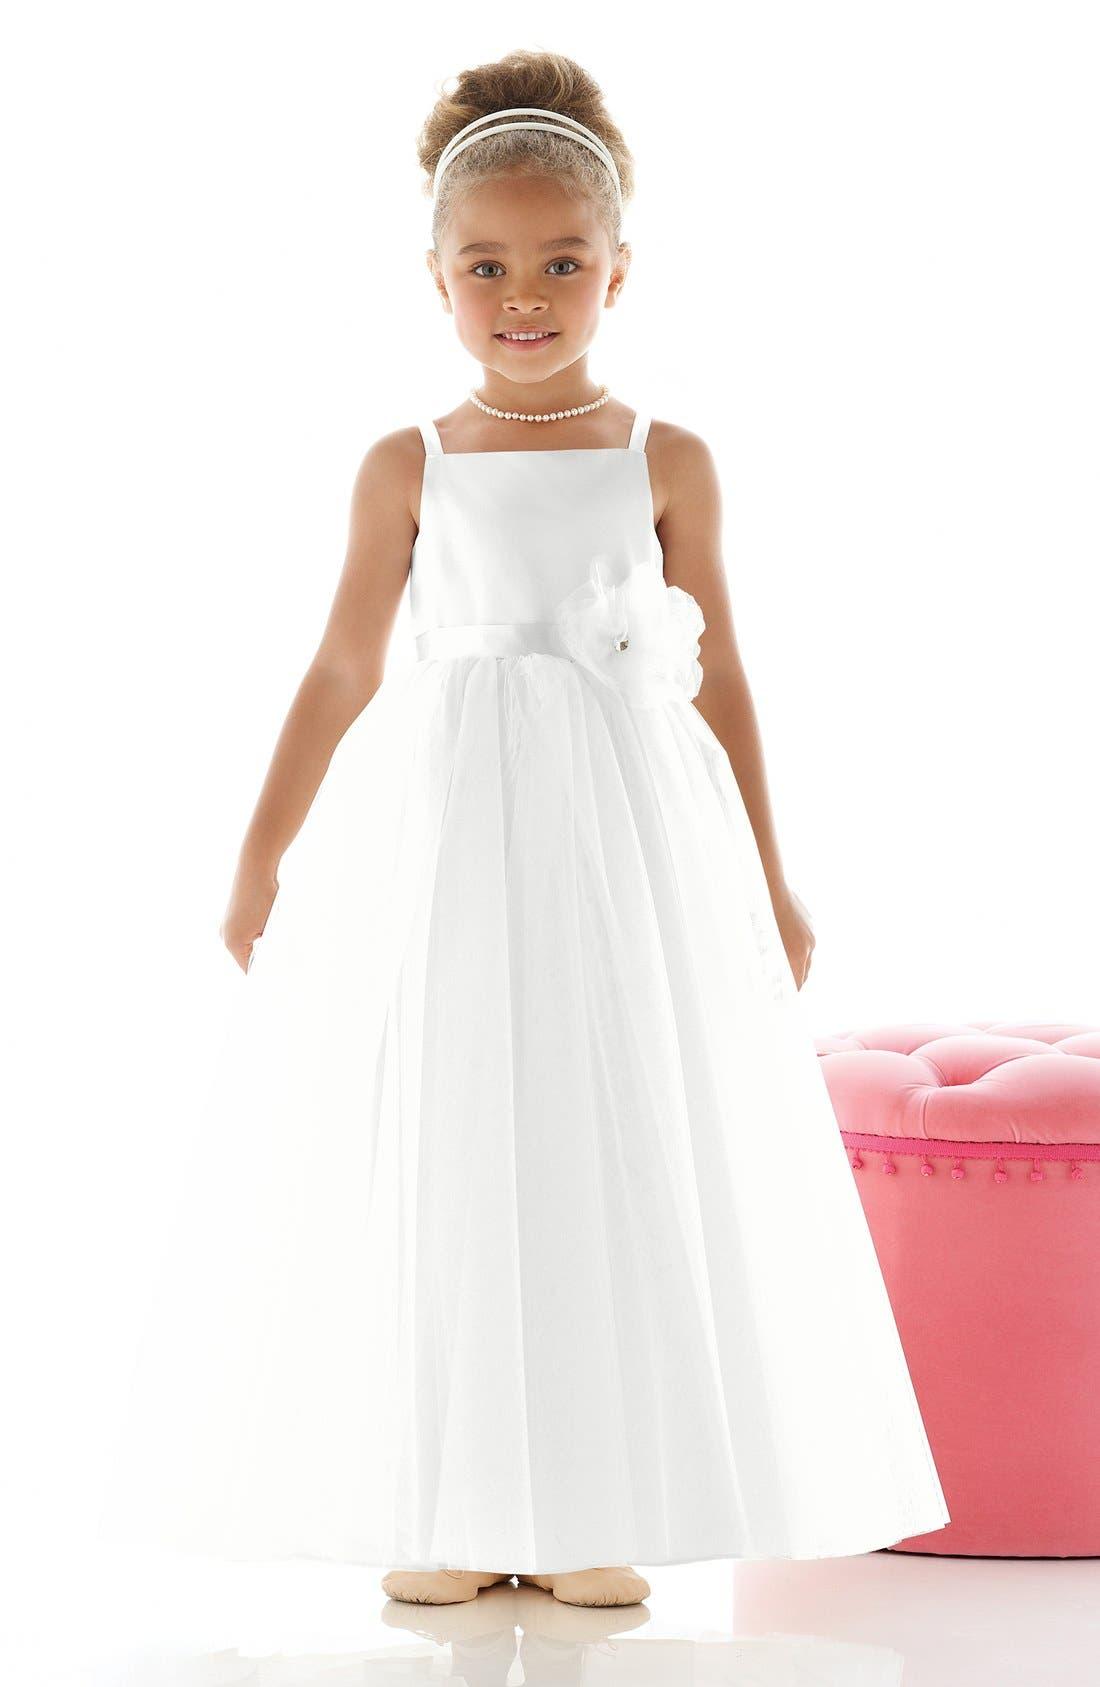 Main Image - Dessy Collection 'Rose' Satin & Tulle Flower Girl Dress (Toddler, Little Girls & Big Girls)